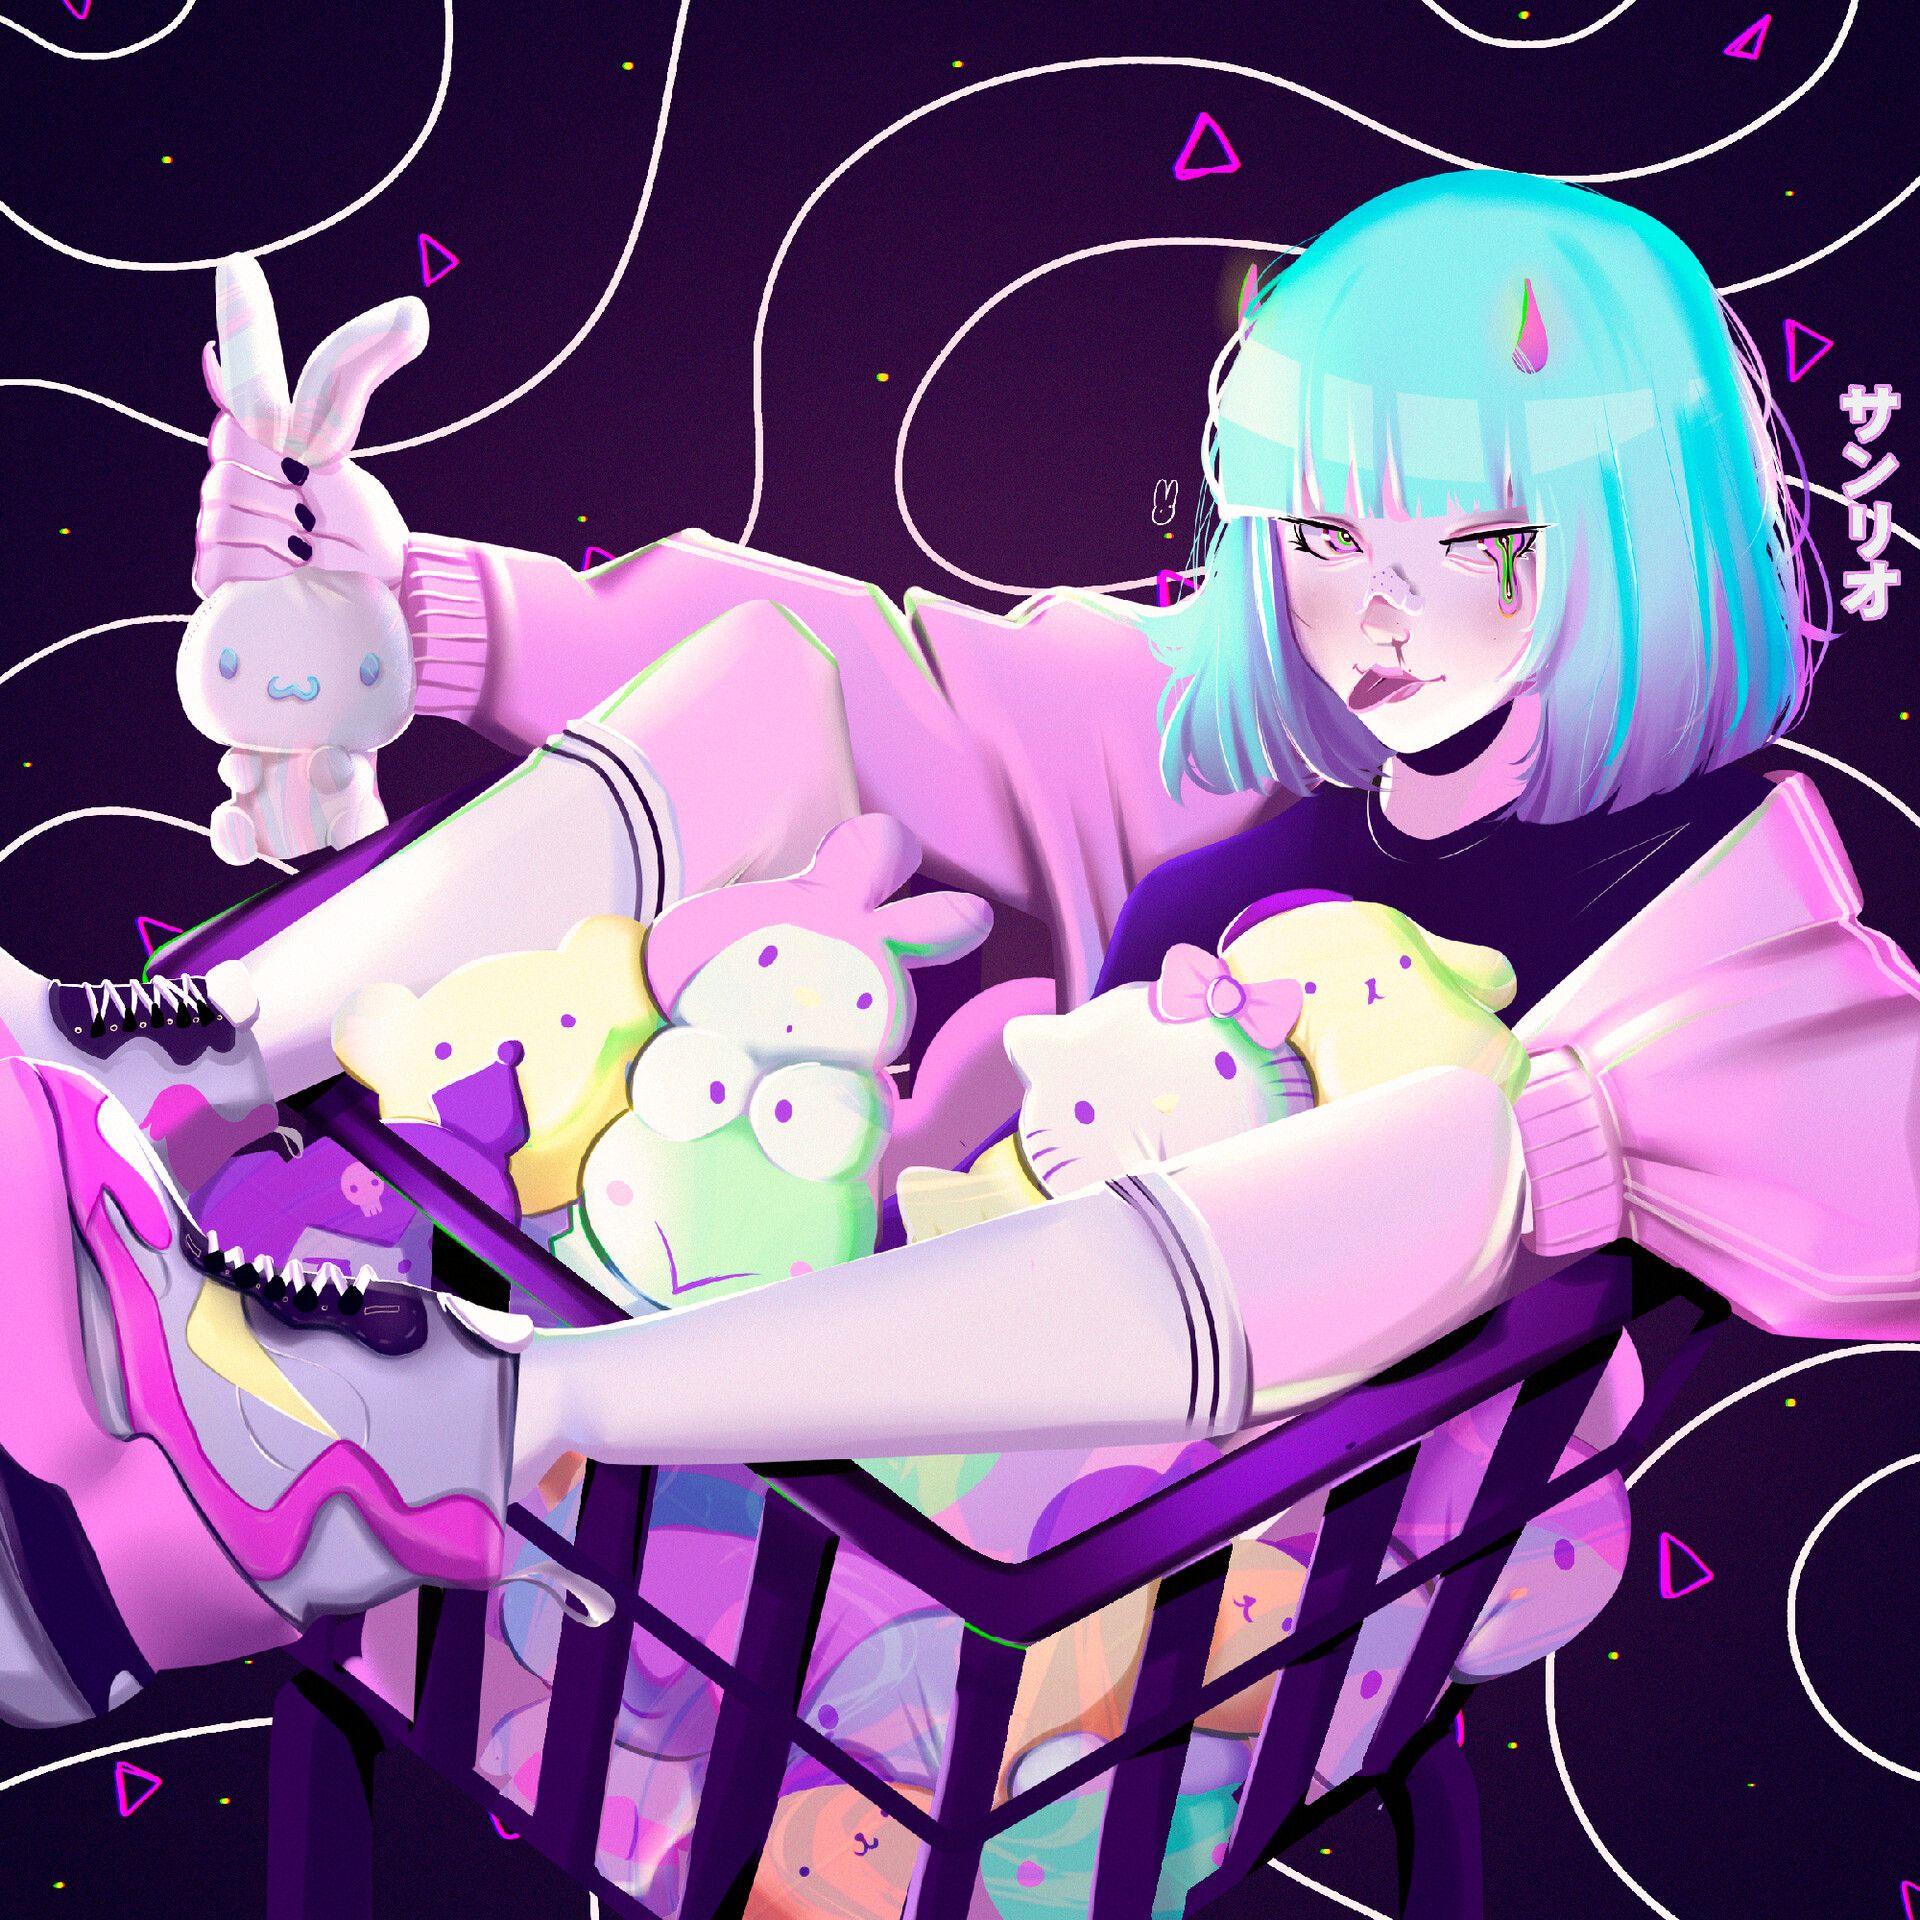 Sanrio In 2020 Anime Art Kawaii Anime Anime